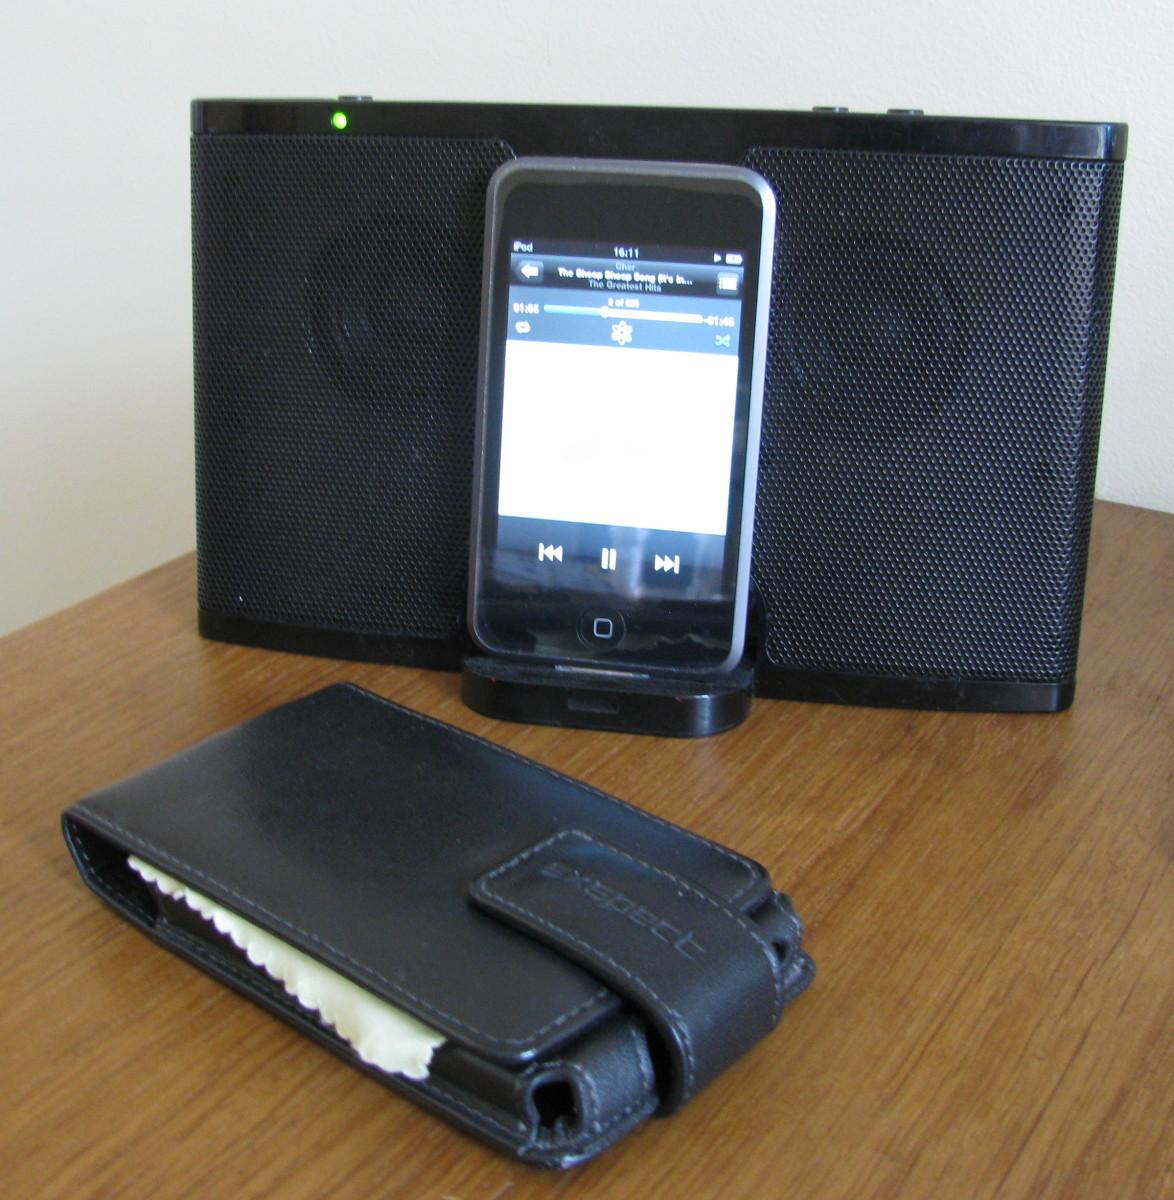 Love my iPod!